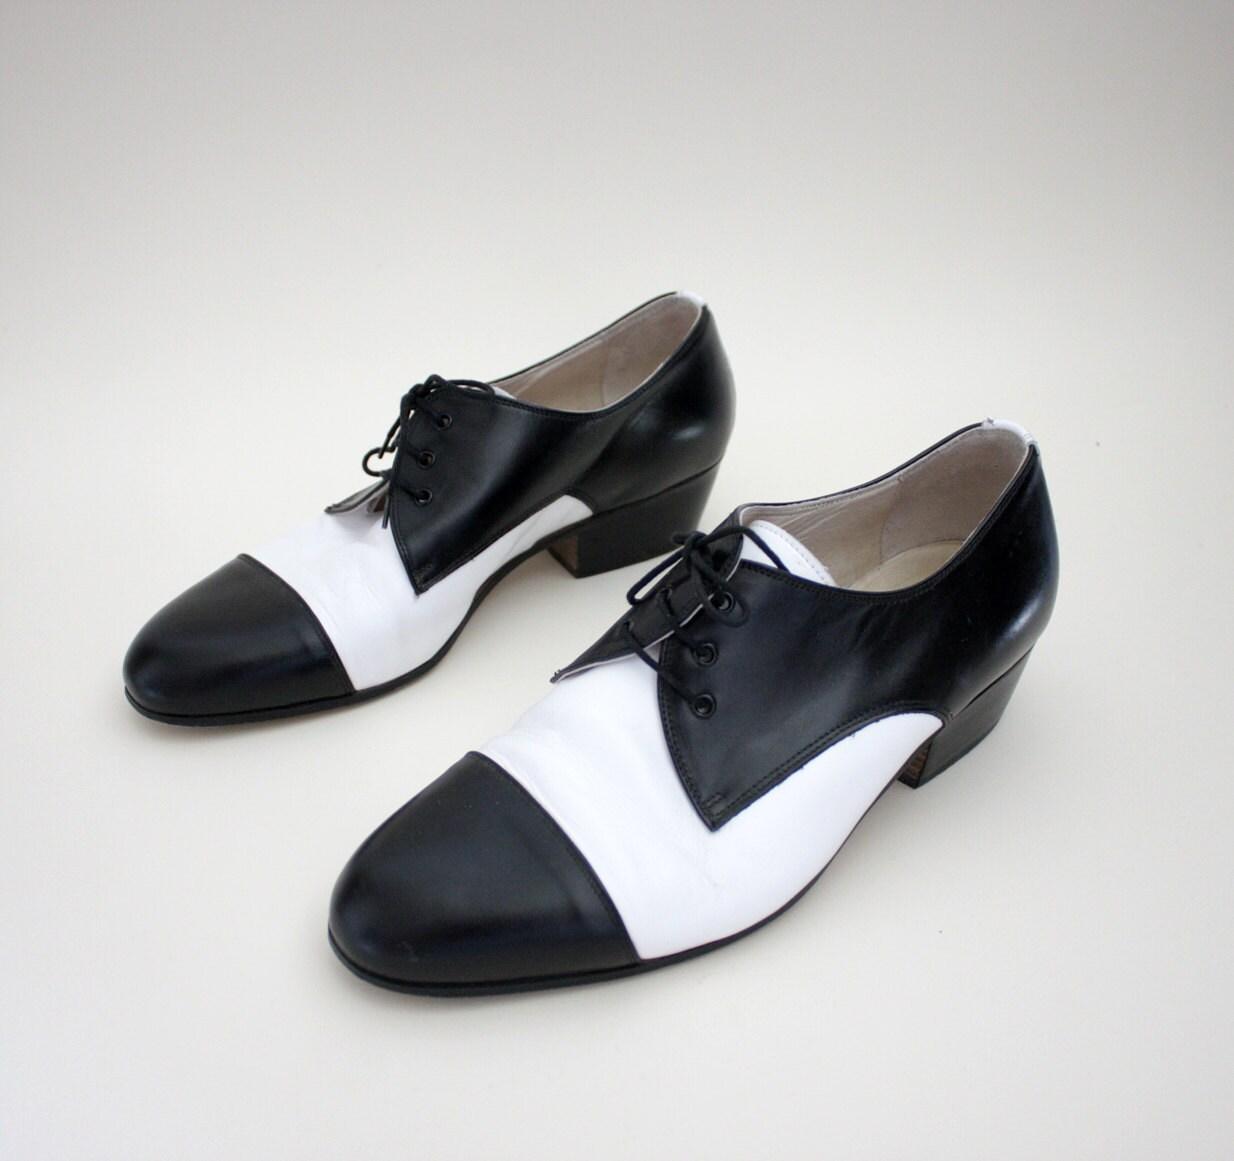 vintage shoes black and white tuxedo mens oxfords size 42 9